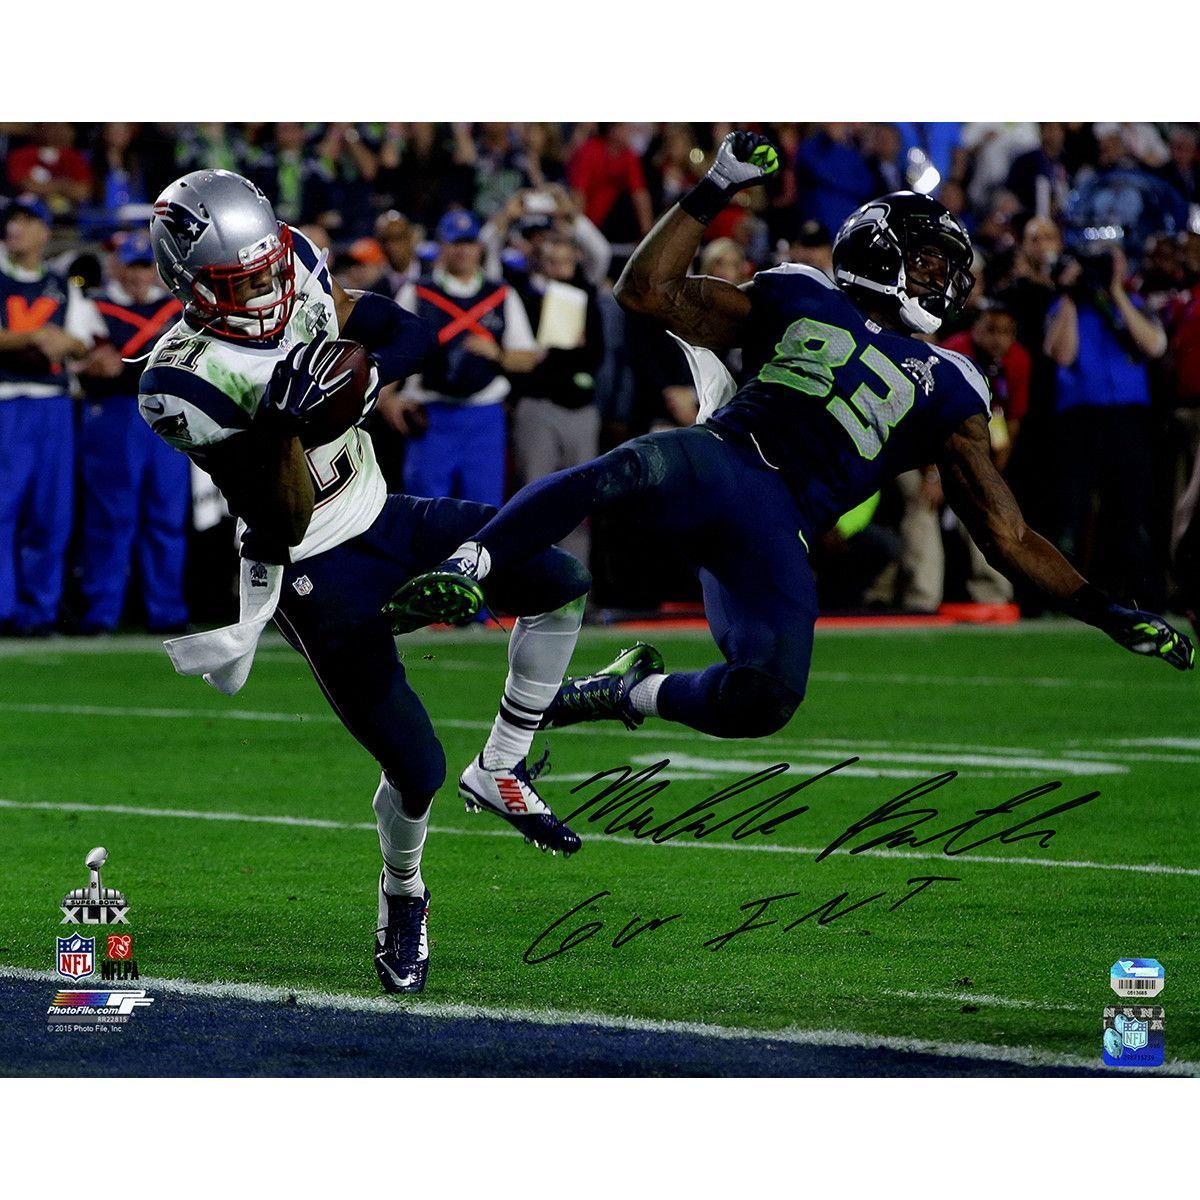 Malcolm Butler Signed Sb 49 Interception Vs Seahawks 16x20 Photo W Gw Int Insc Fanatics Holo Only Patriots Superbowl Super Bowl Super Bowl Xlix